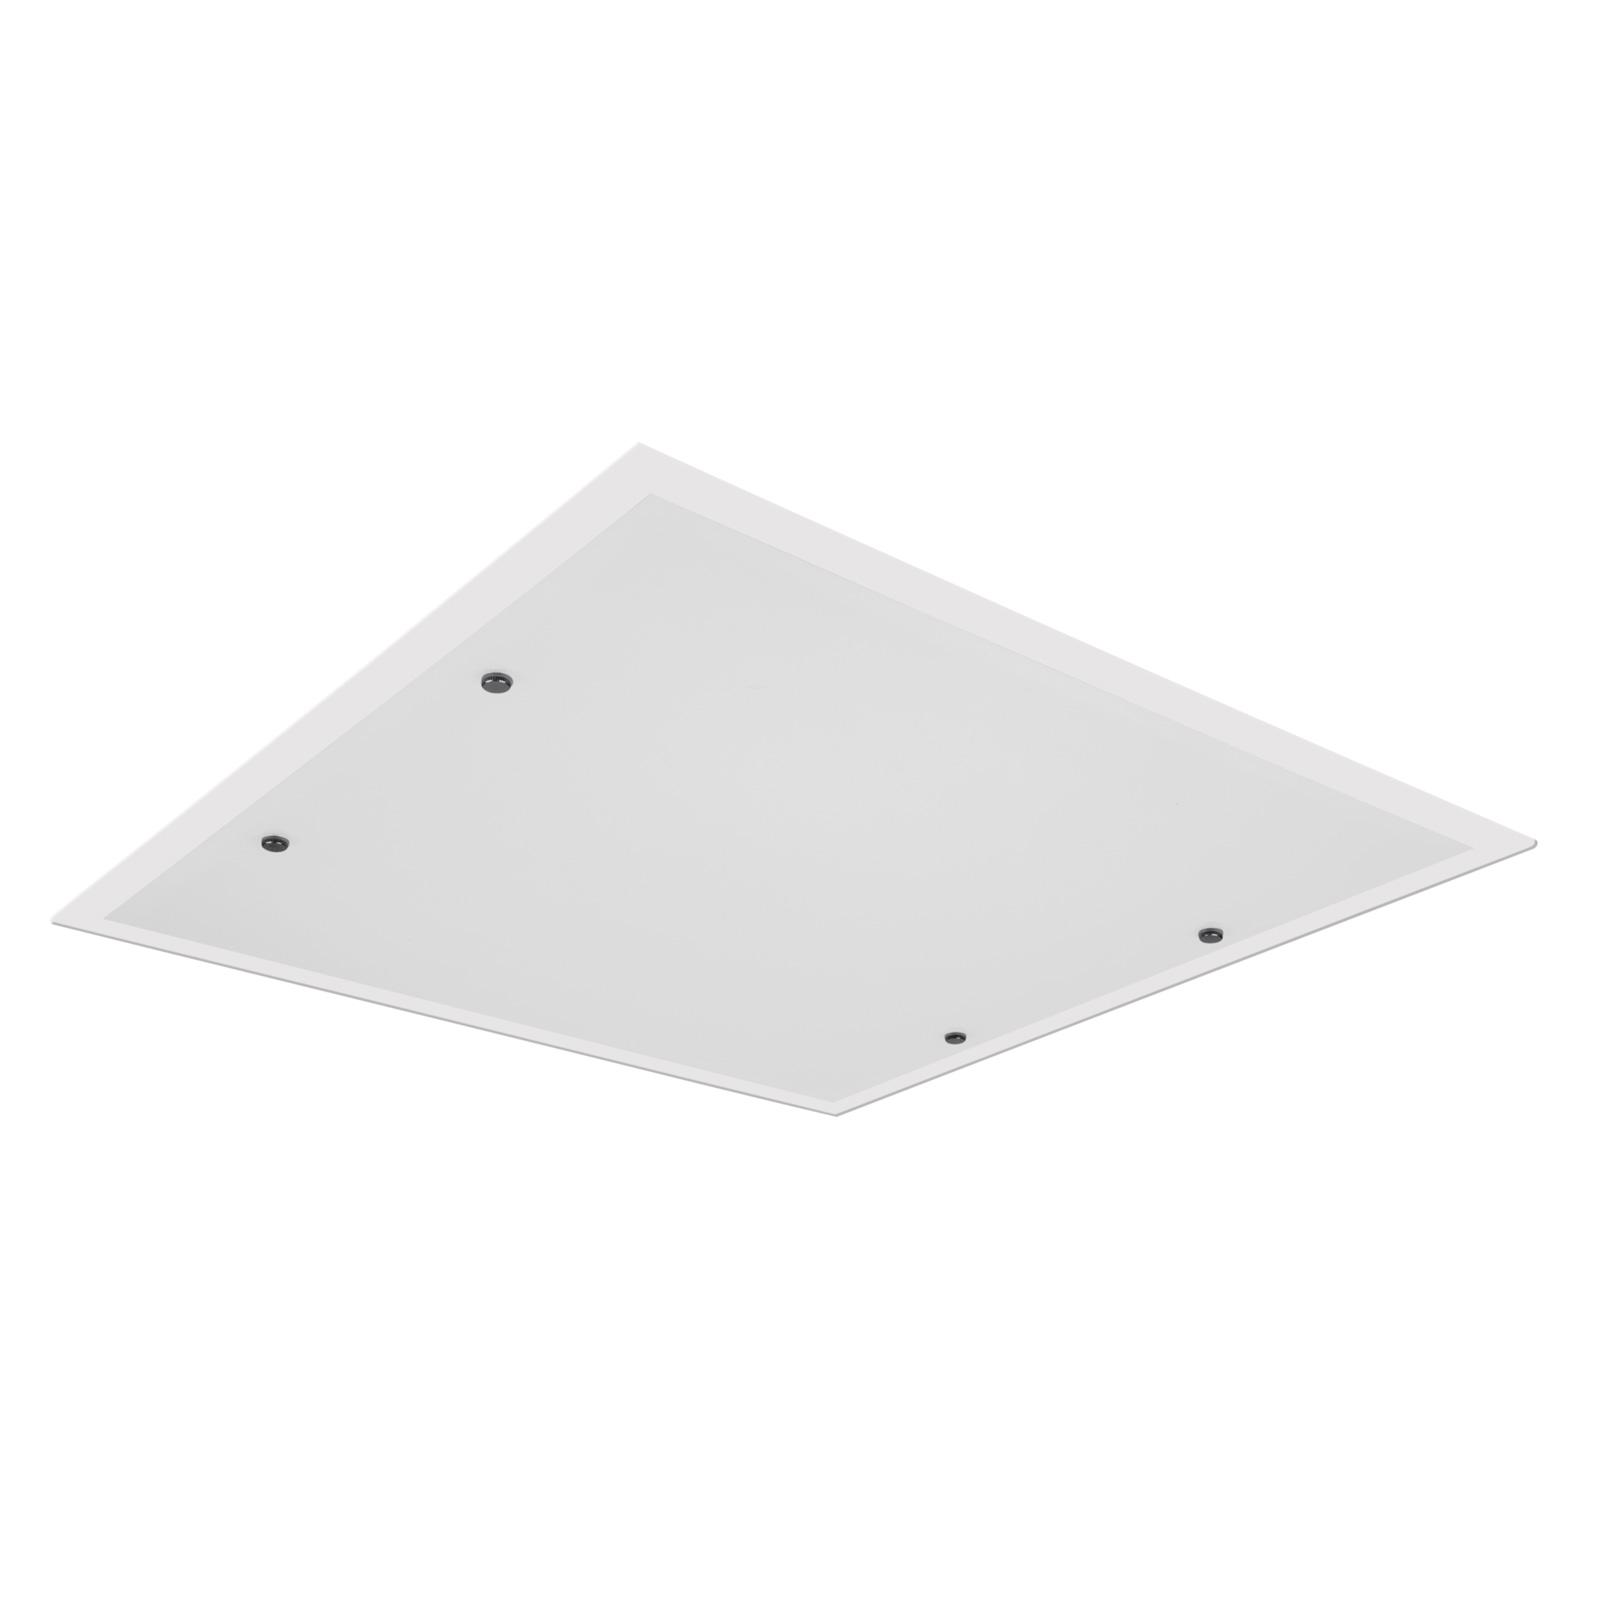 LEDVANCE Lunive Area LED-Deckenleuchte 40cm 4.000K